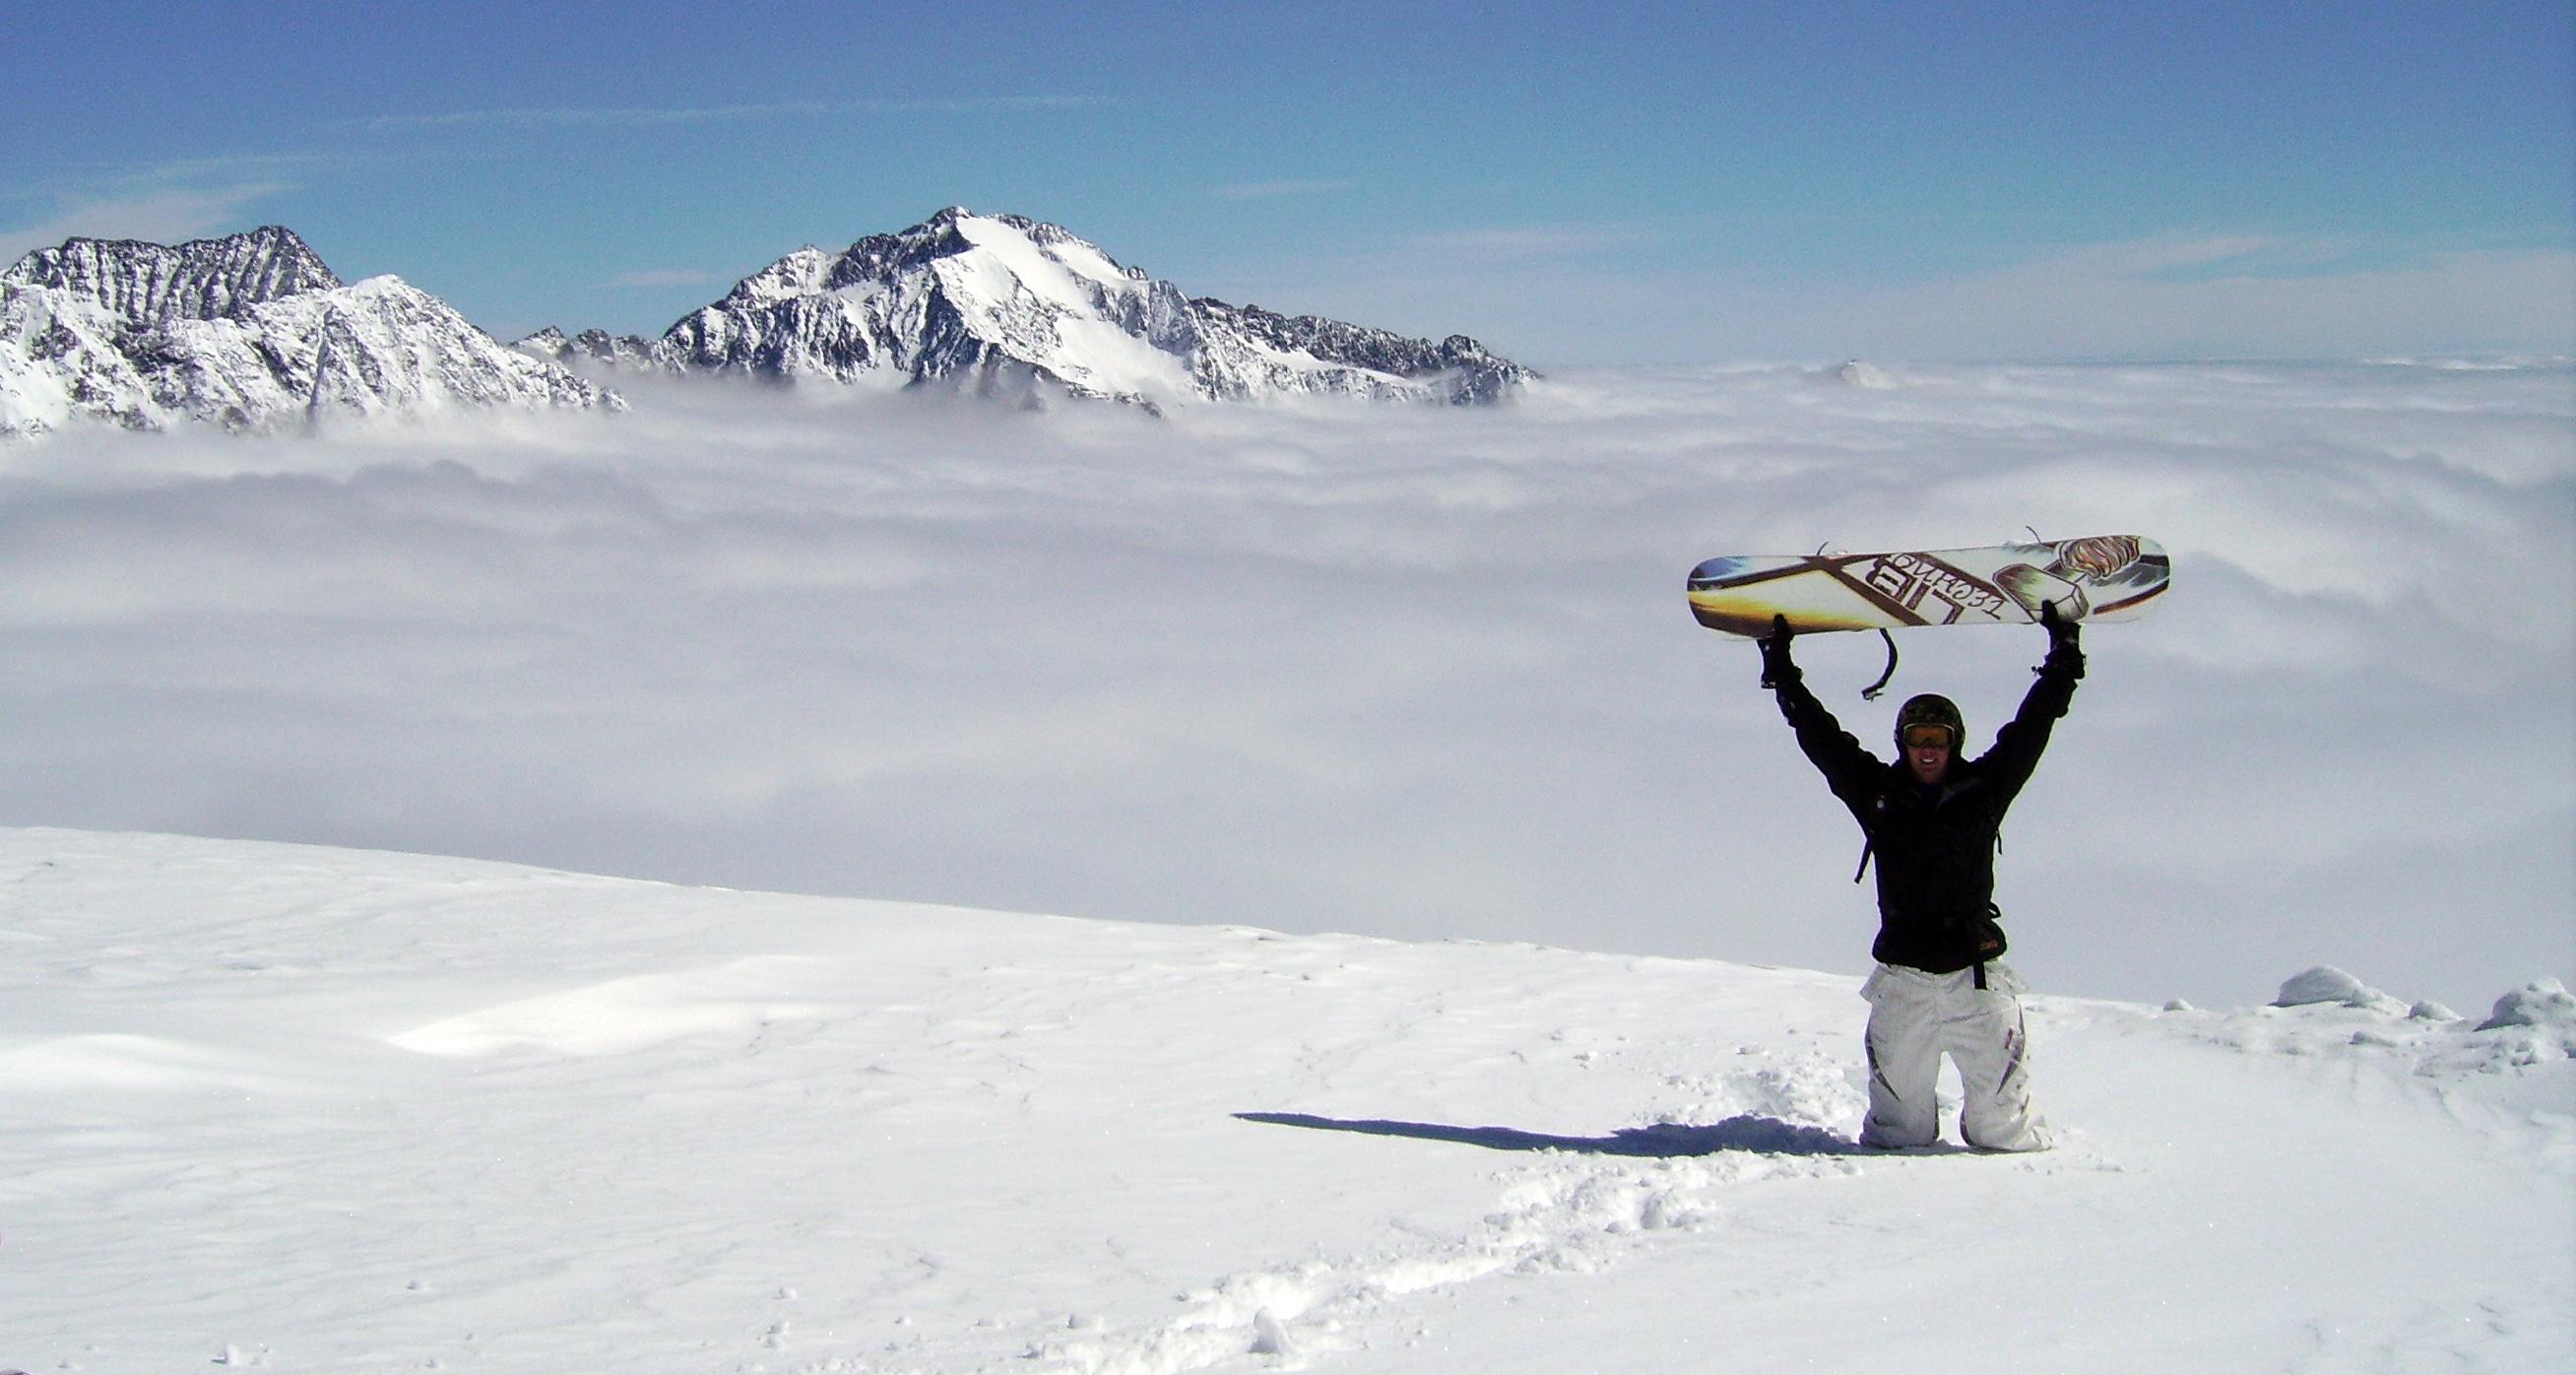 Stubai | Doug's Mountain Getaway